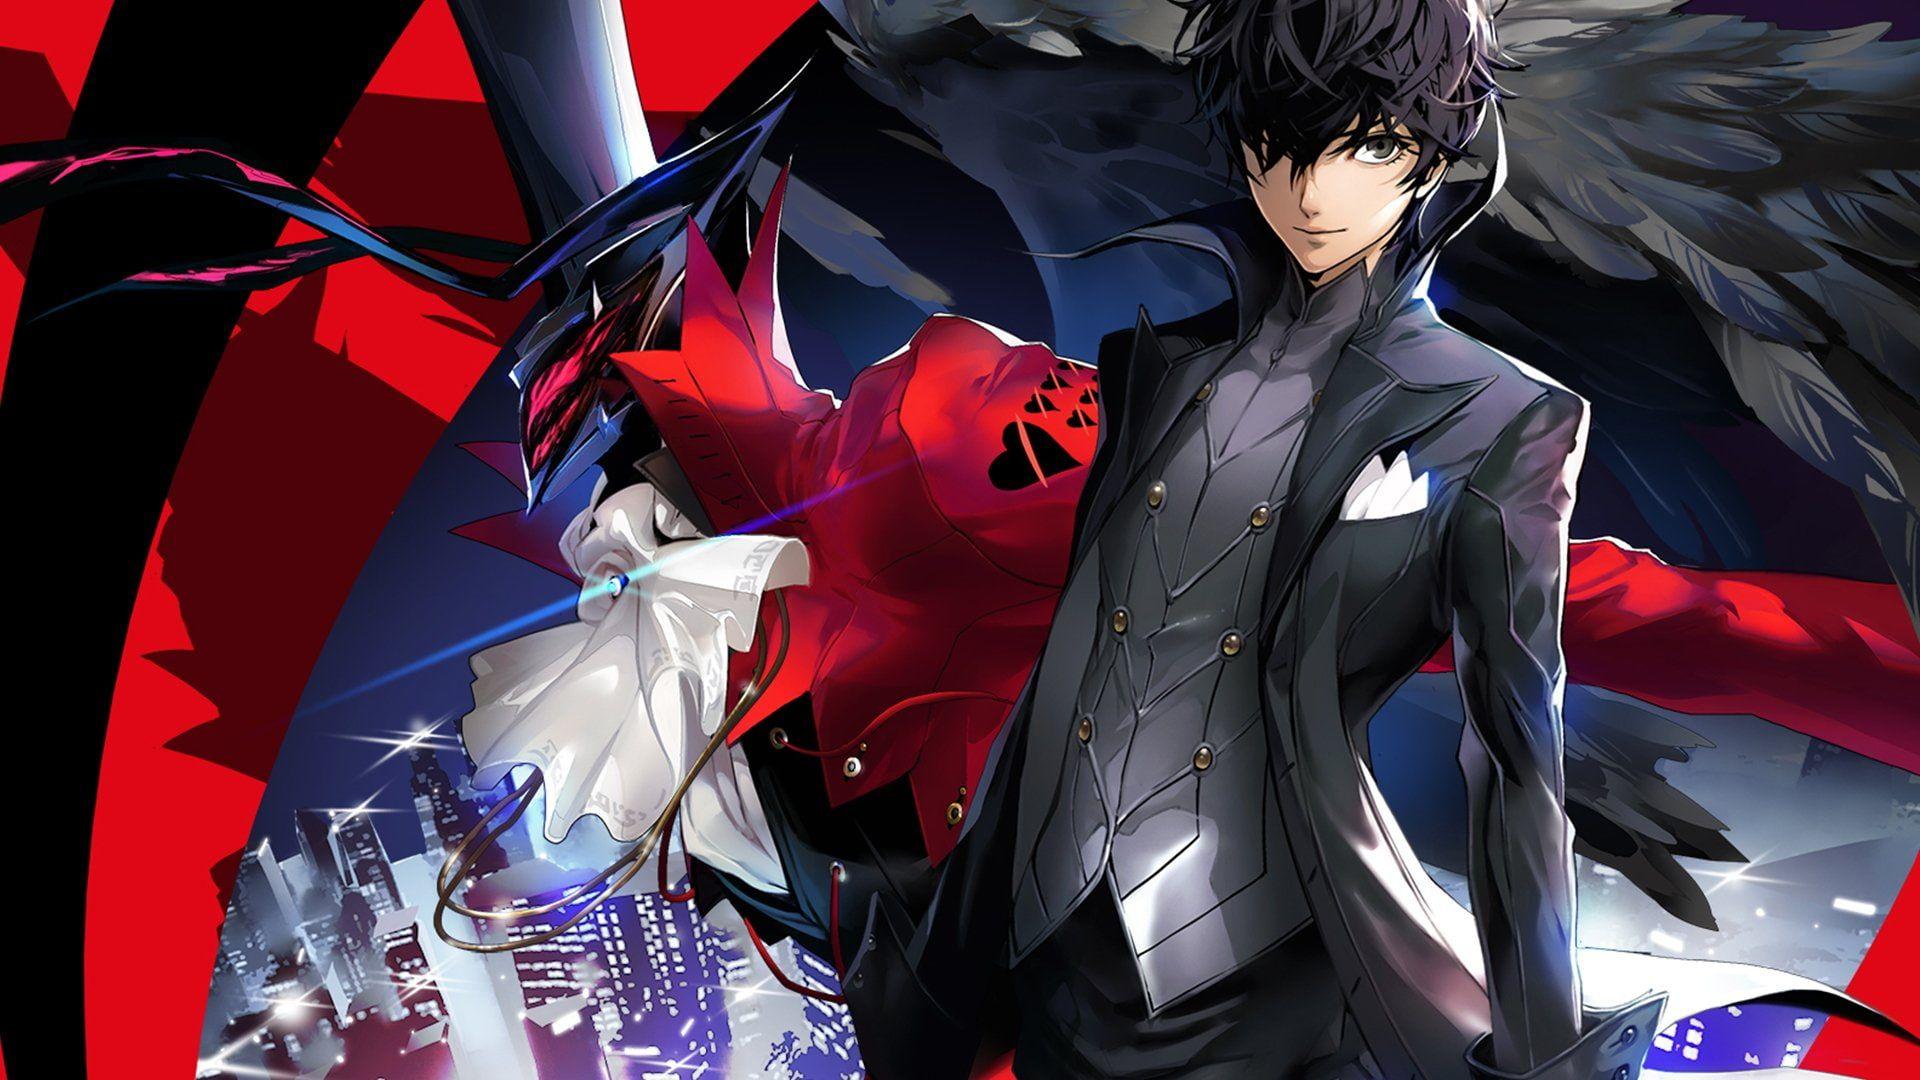 Persona Persona 5 Anime Joker Persona Video Game 1080p Wallpaper Hdwallpaper Desktop In 2020 Persona 5 Persona 5 Joker Persona 5 Anime